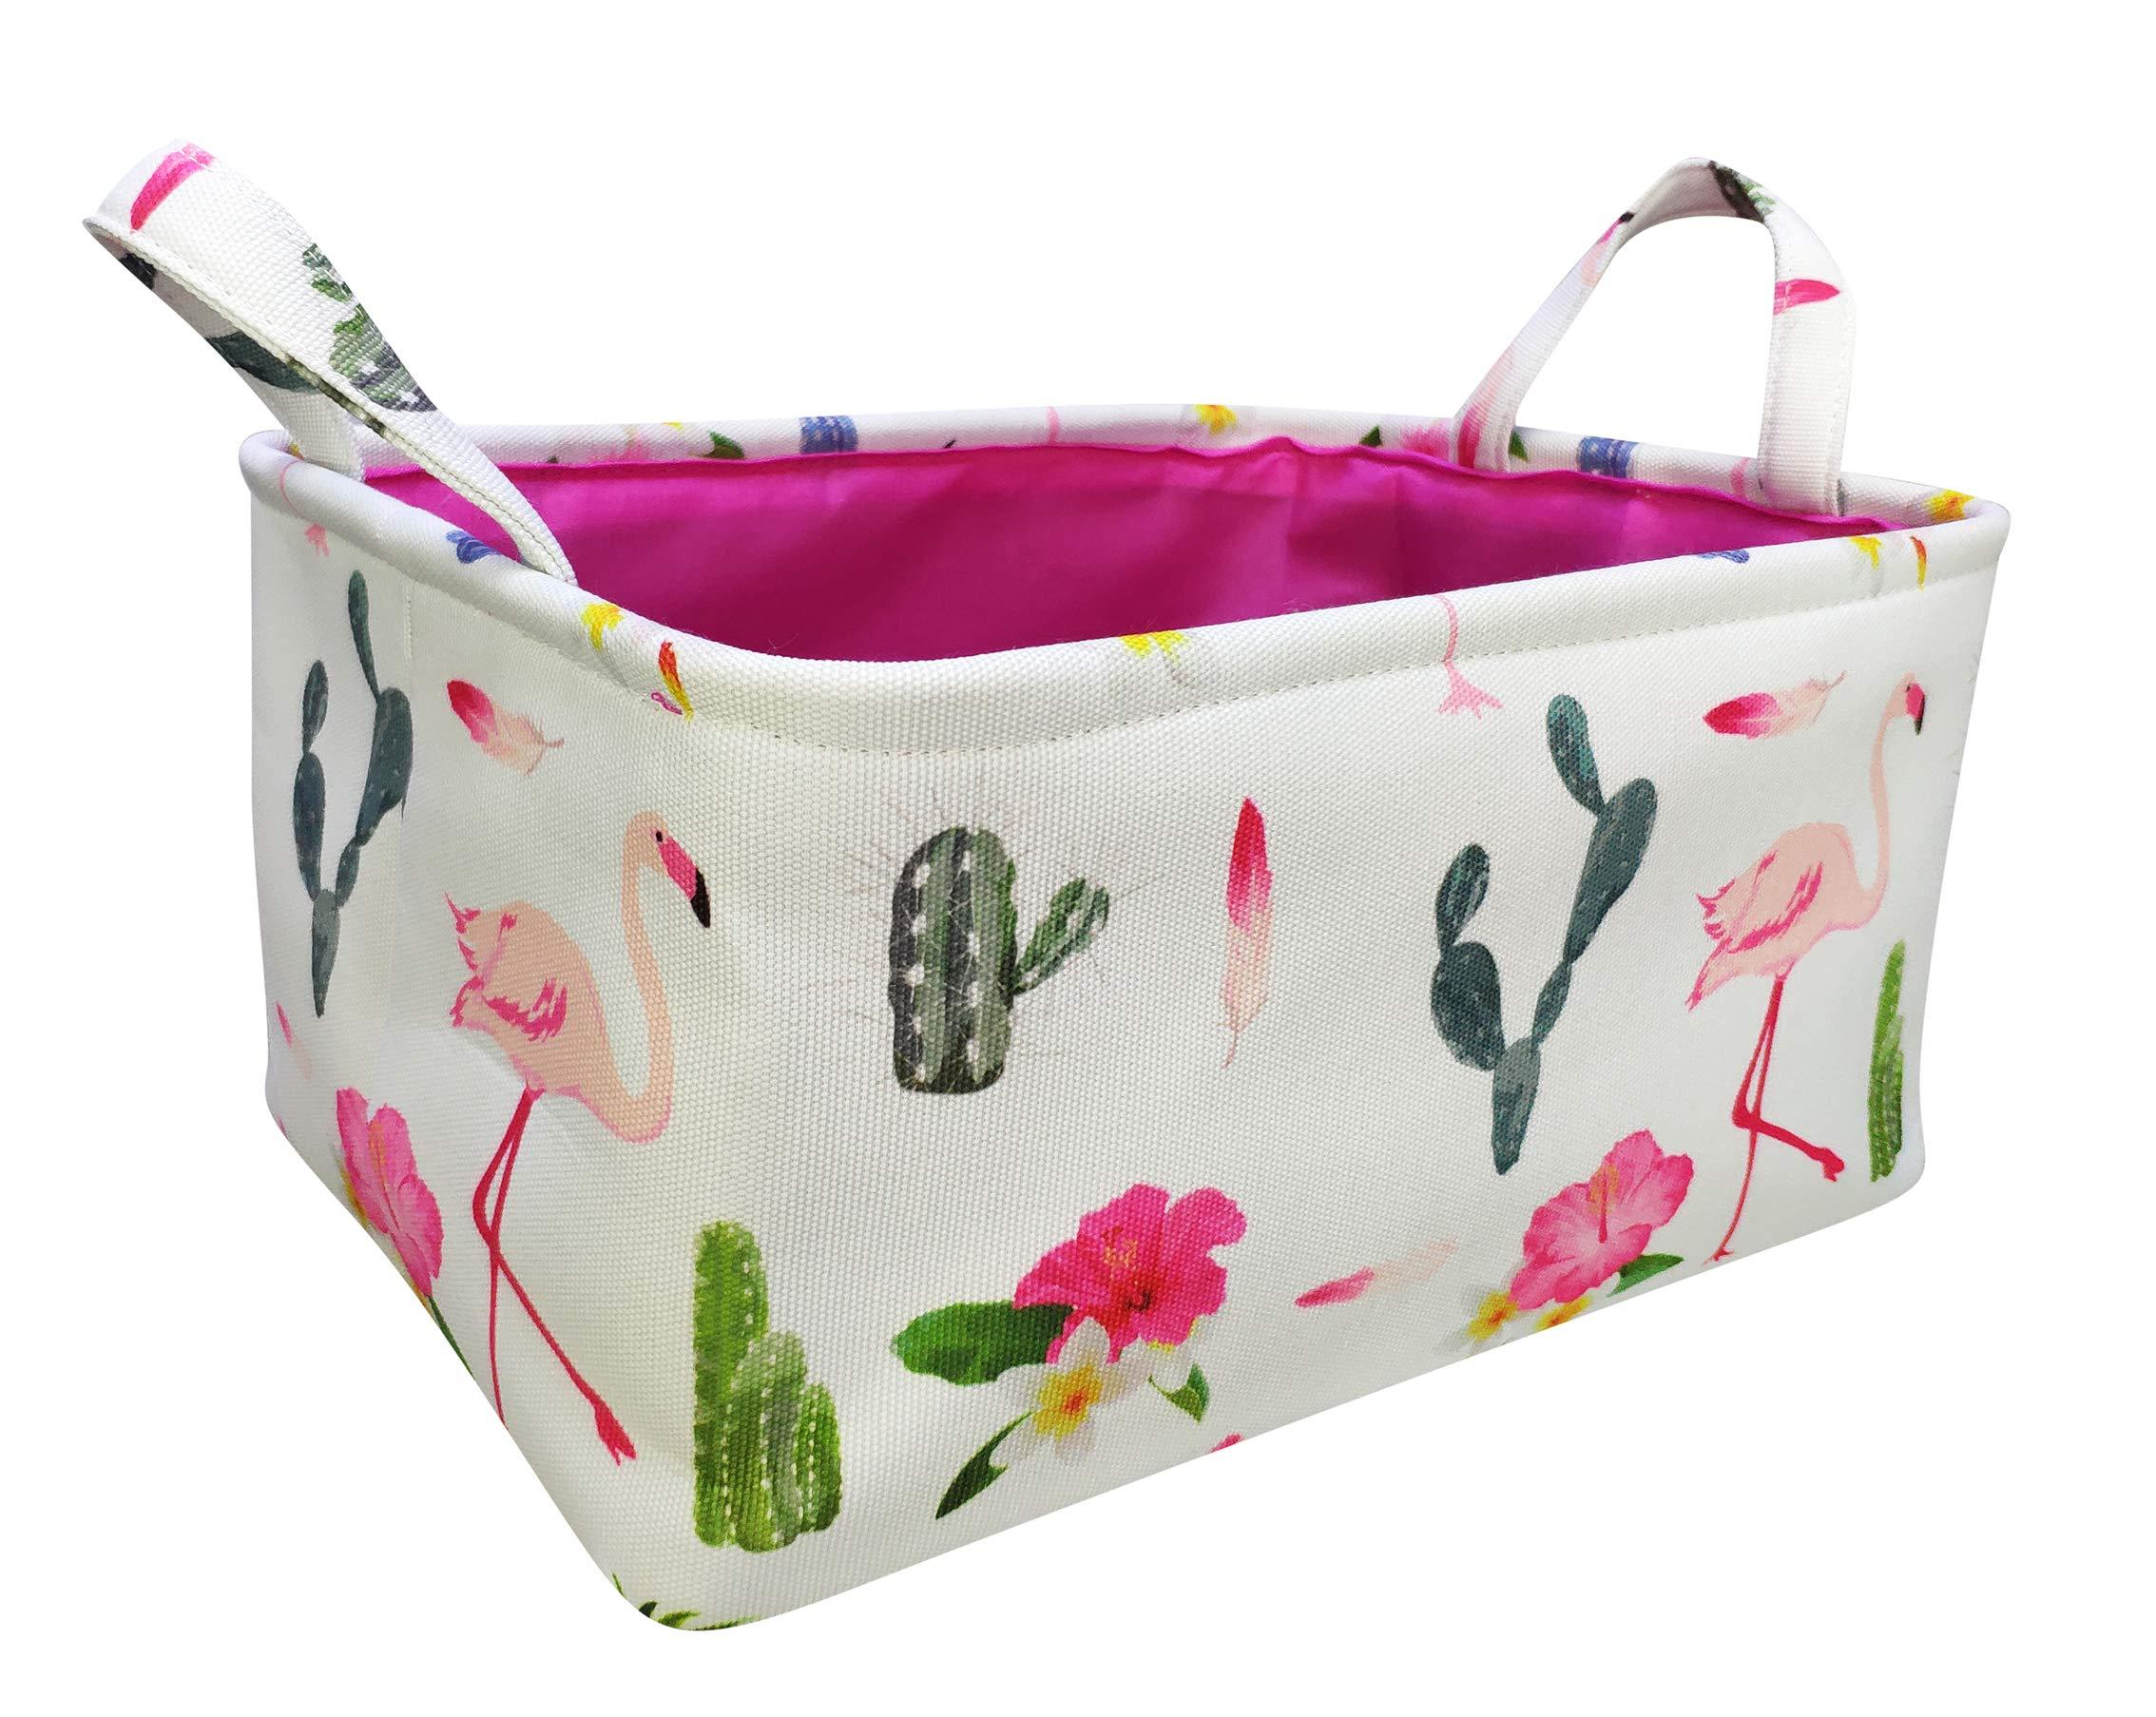 LEELI Rectangular Canvas Storage Basket Collapse Fabric Cartoon Storage Cube Bin with Handles for Organizing Kids Toy/Playroom Organization/Toy Bin/Closet /Shelf Baskets/Baby Hamper (Flamingo)